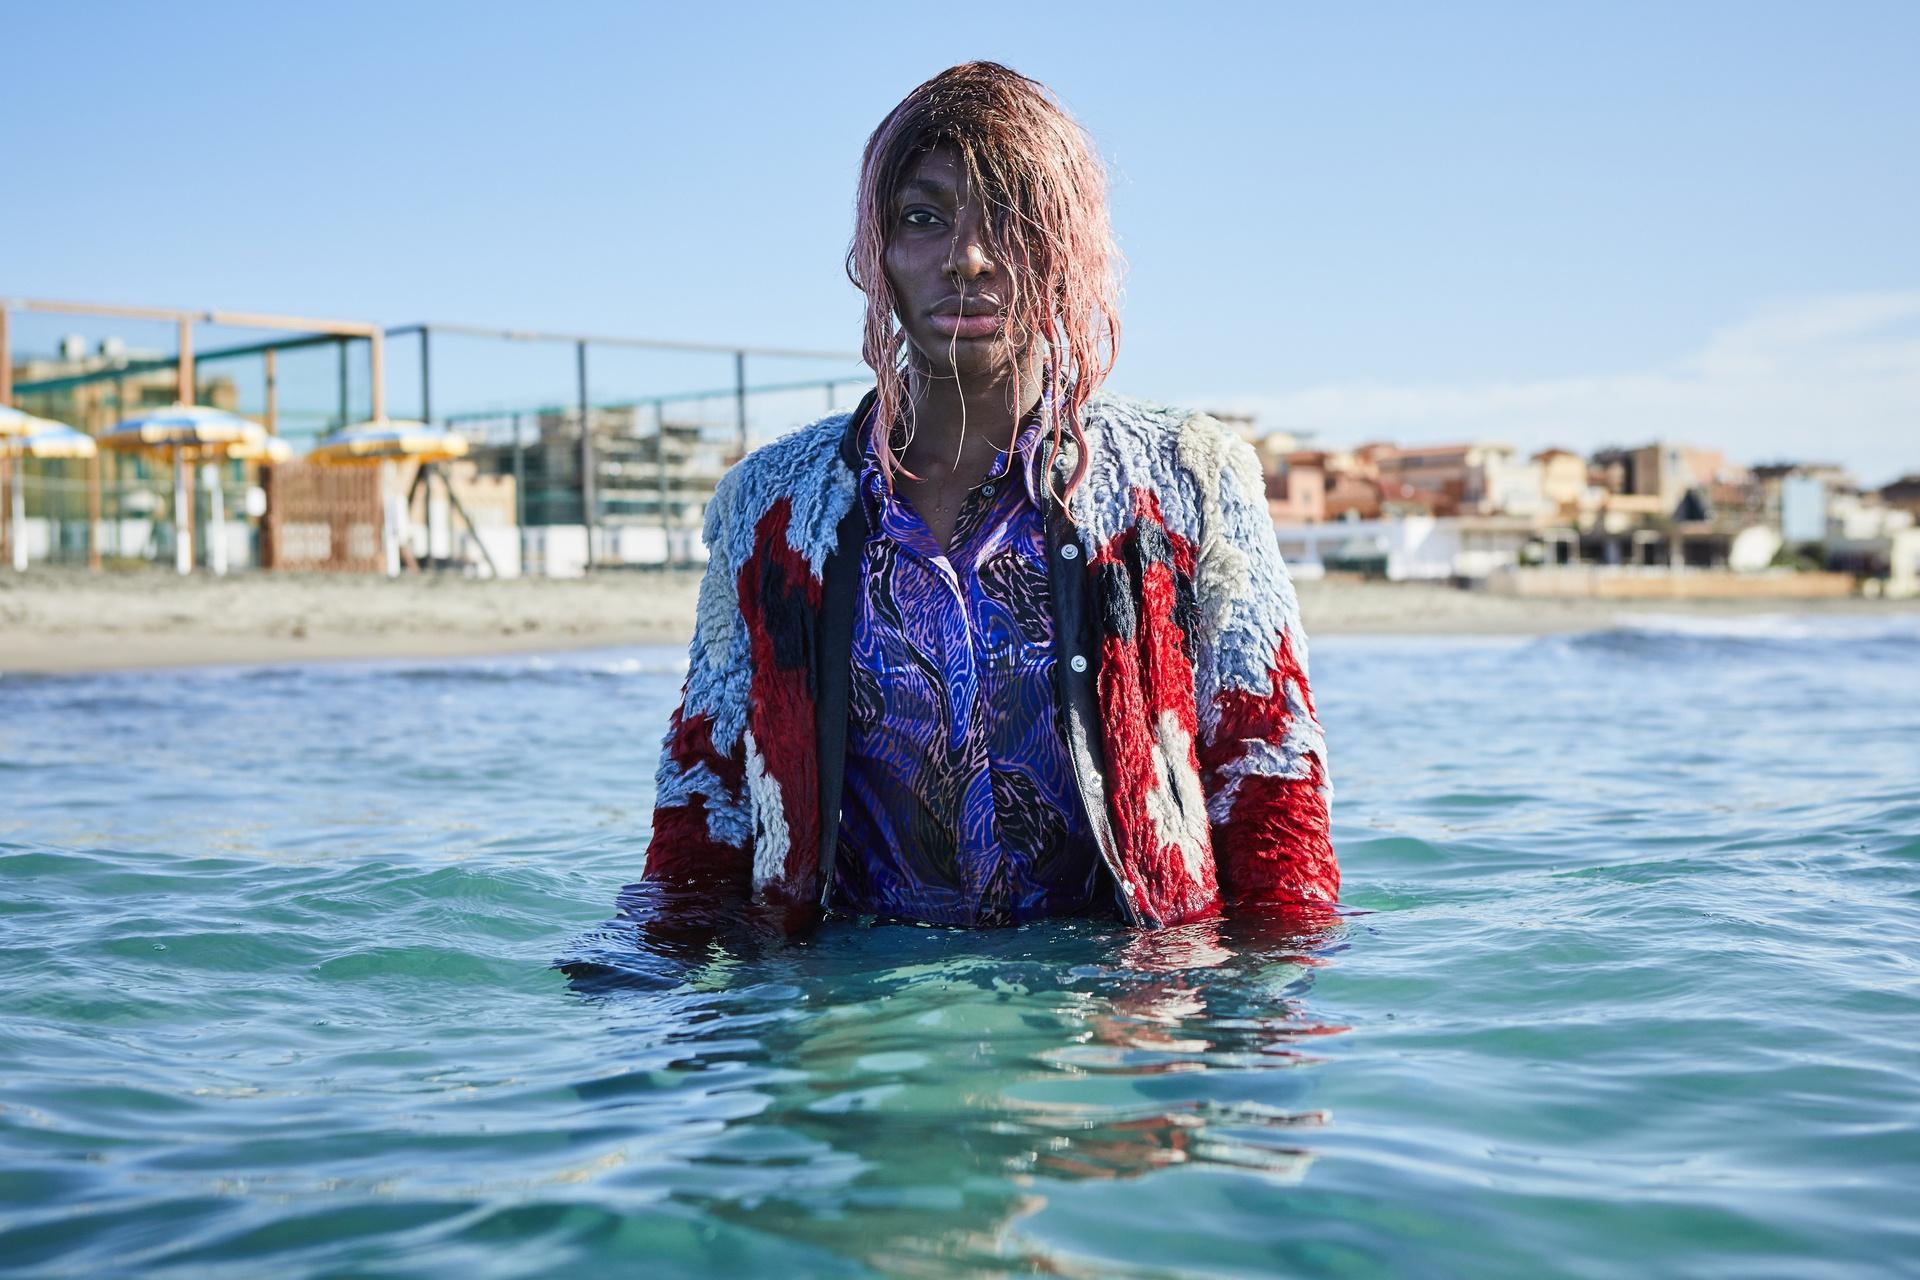 Michaela Coel + 'I May Destroy You' Dominate 2021 BAFTA TV Awards